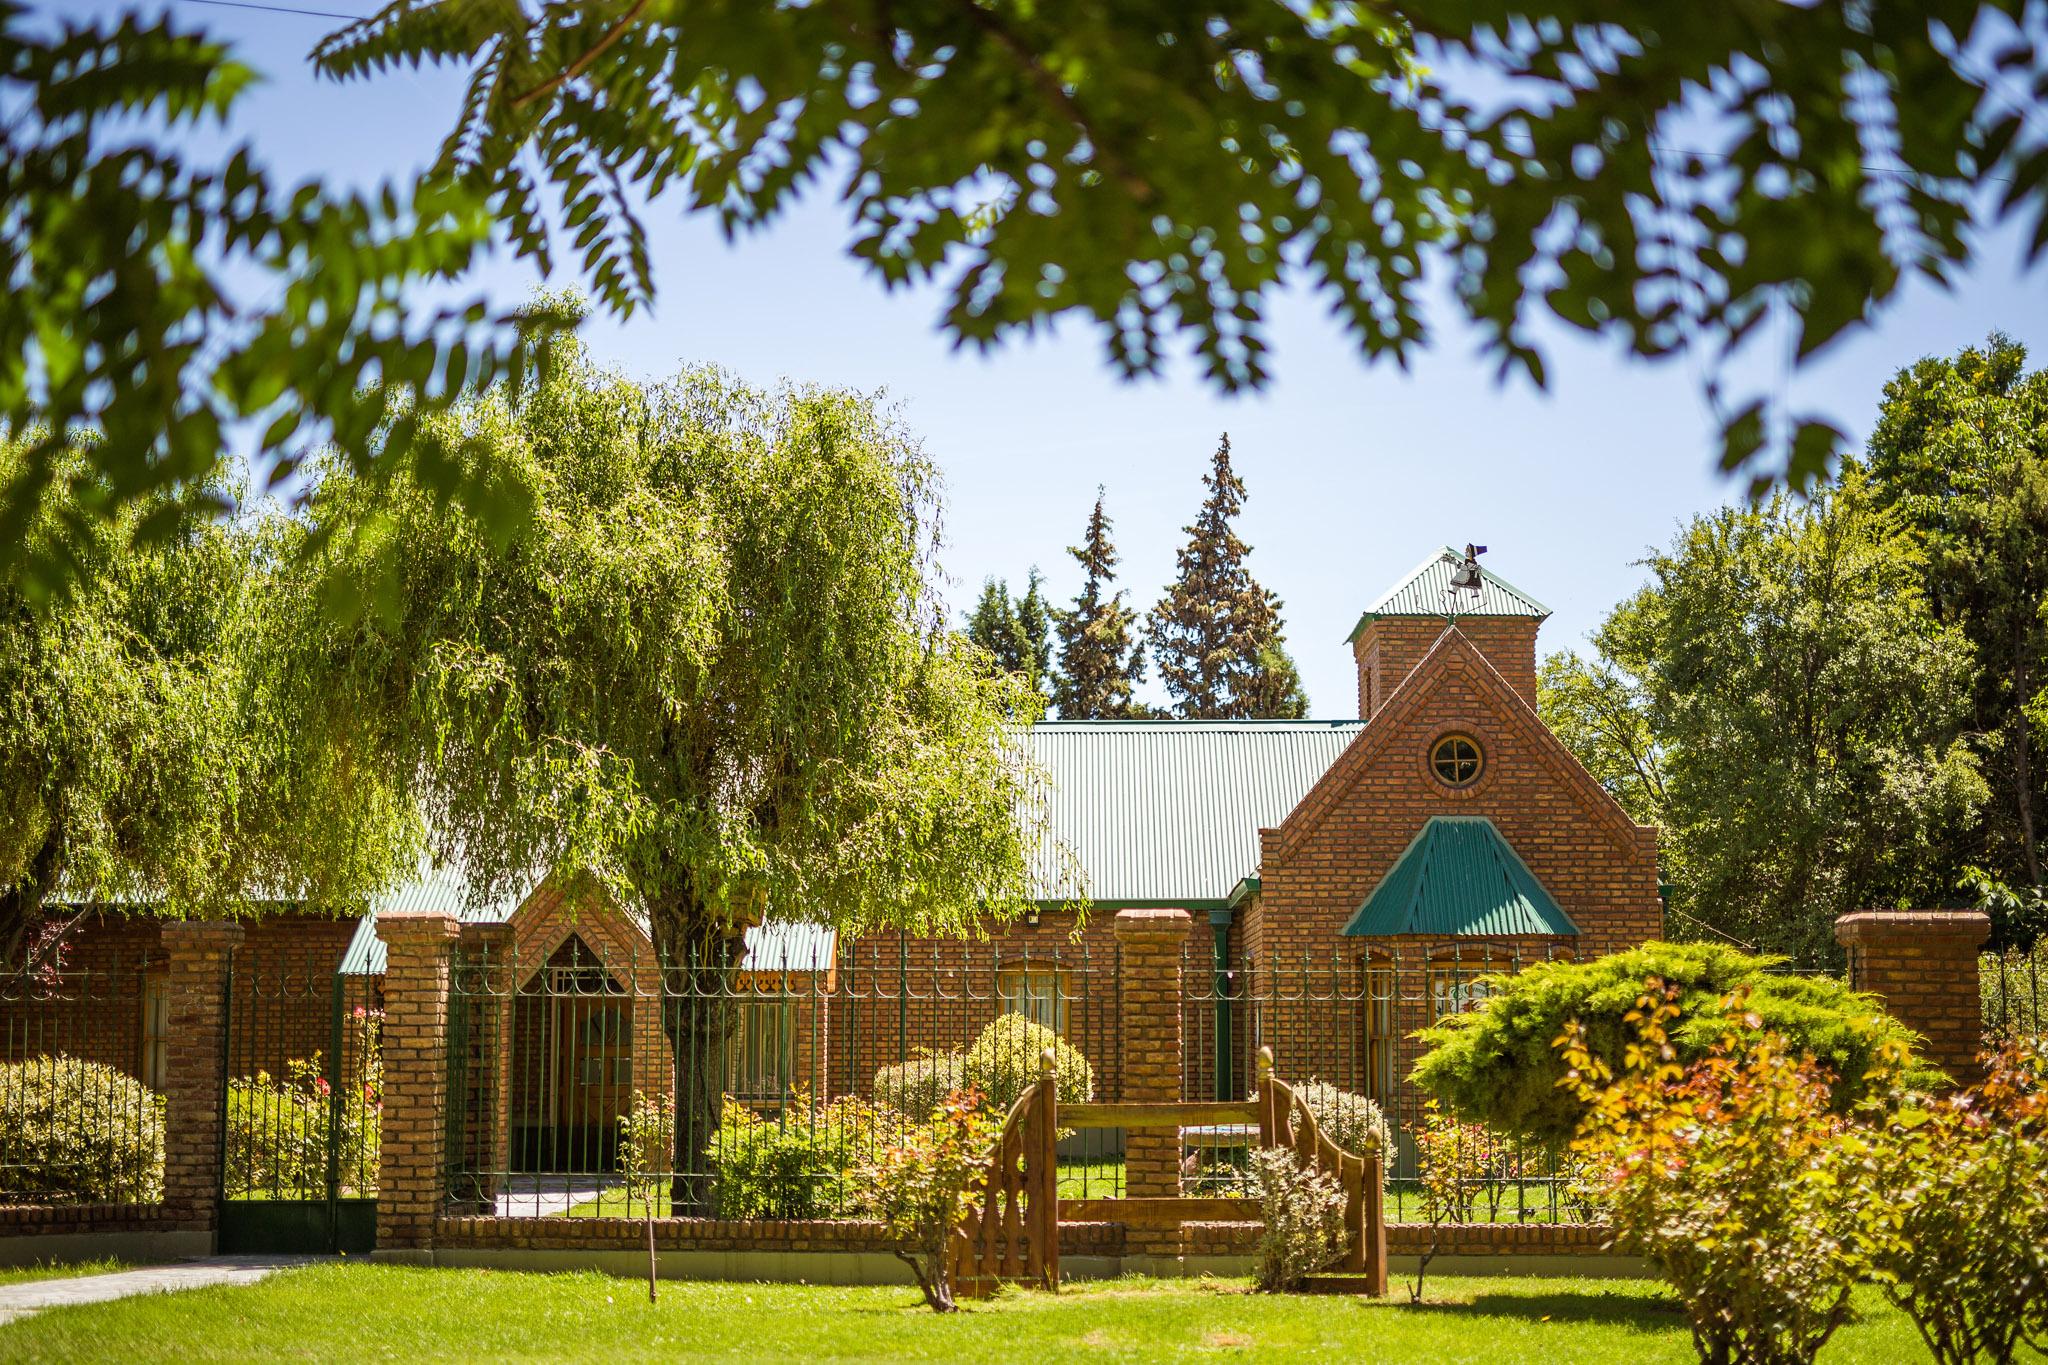 wedding-travellers-argentina-gaiman-brick-house-willow-tree